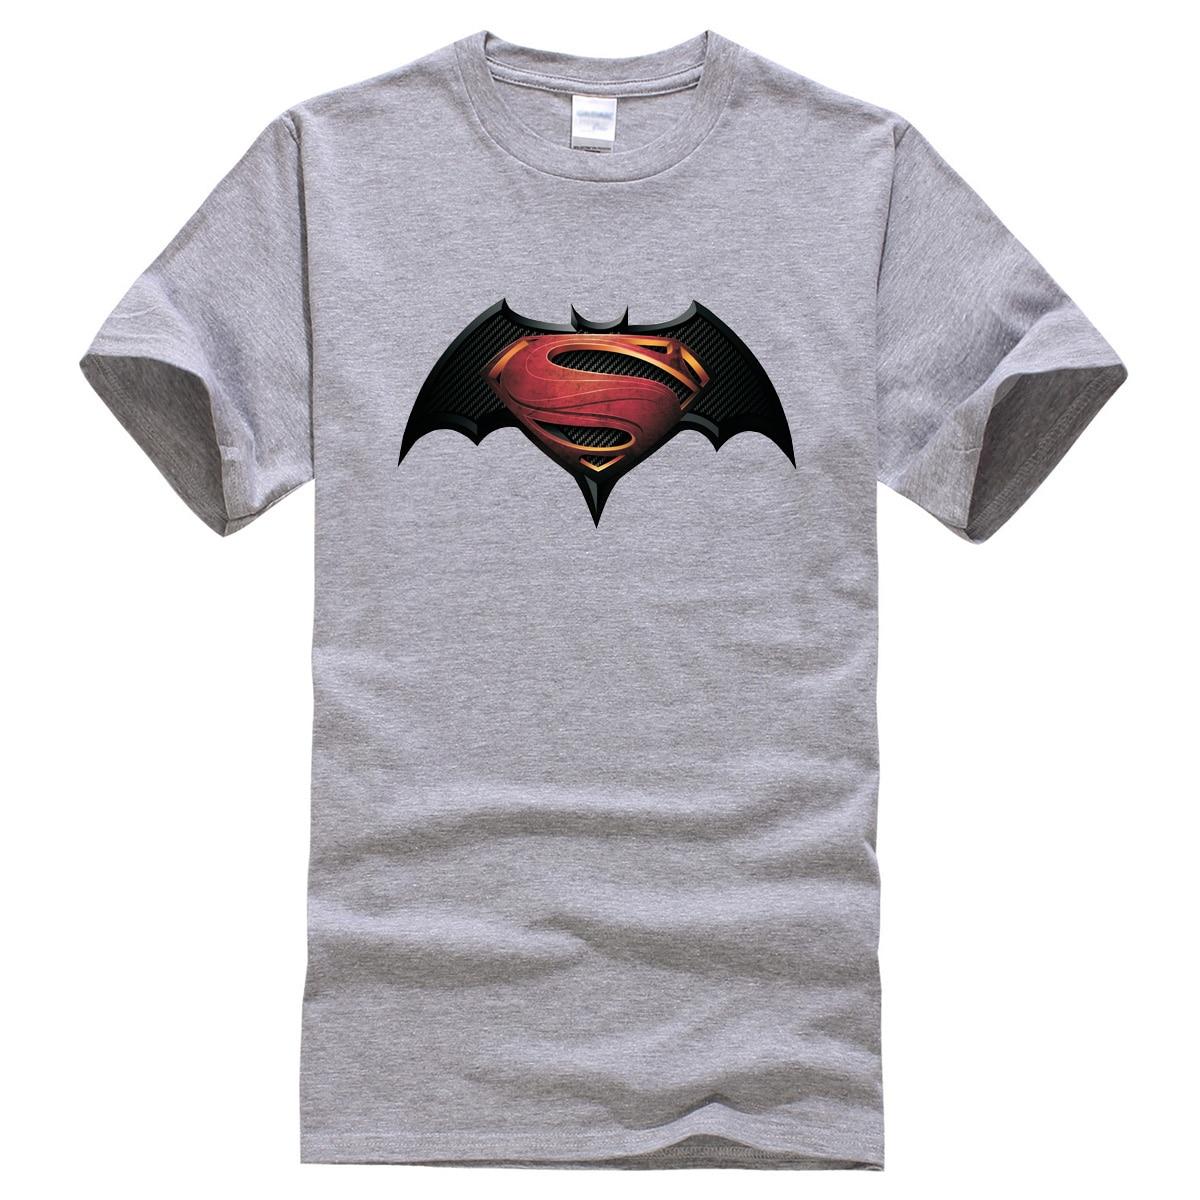 Hot 2019 summer T-shirt for men short sleeve loose tee shirt BATMAN fashion various colours available men's T-shirts top brand